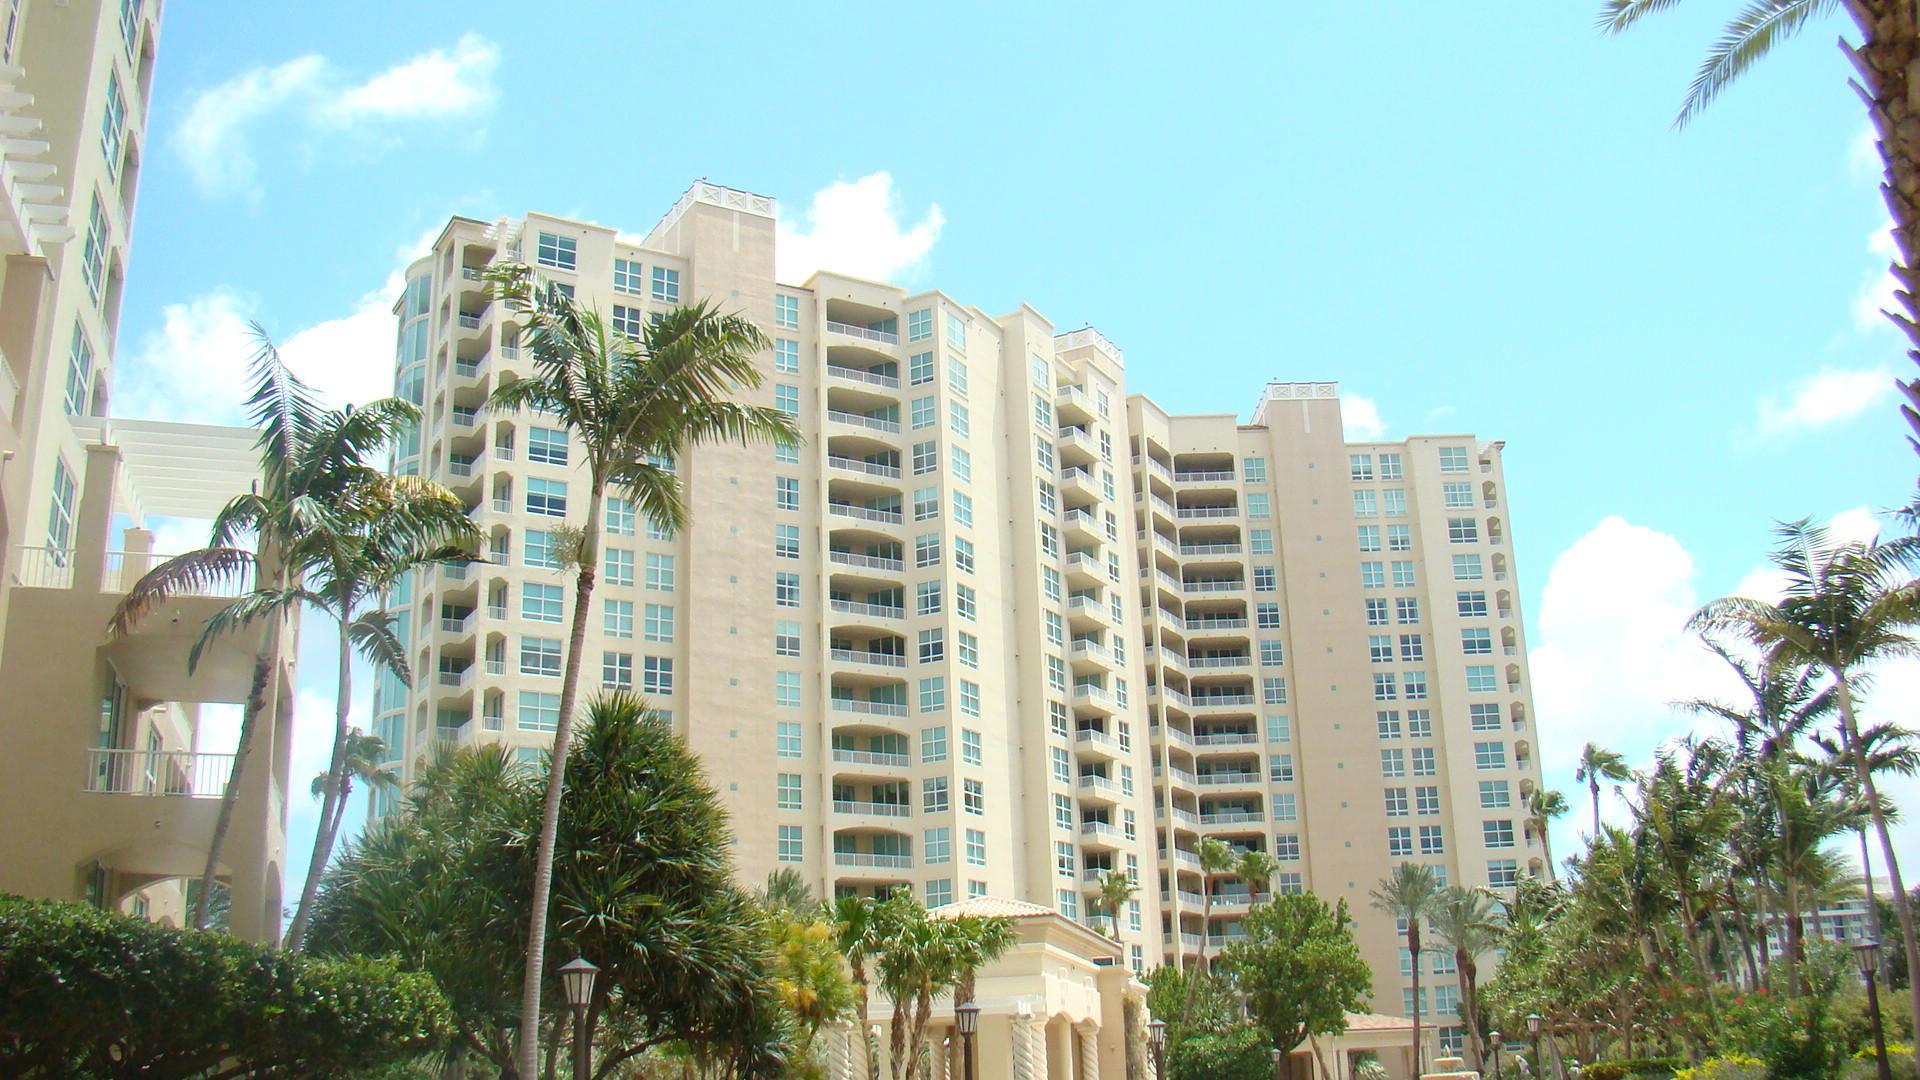 3700 S Ocean Boulevard #110b - 33487 - FL - Highland Beach